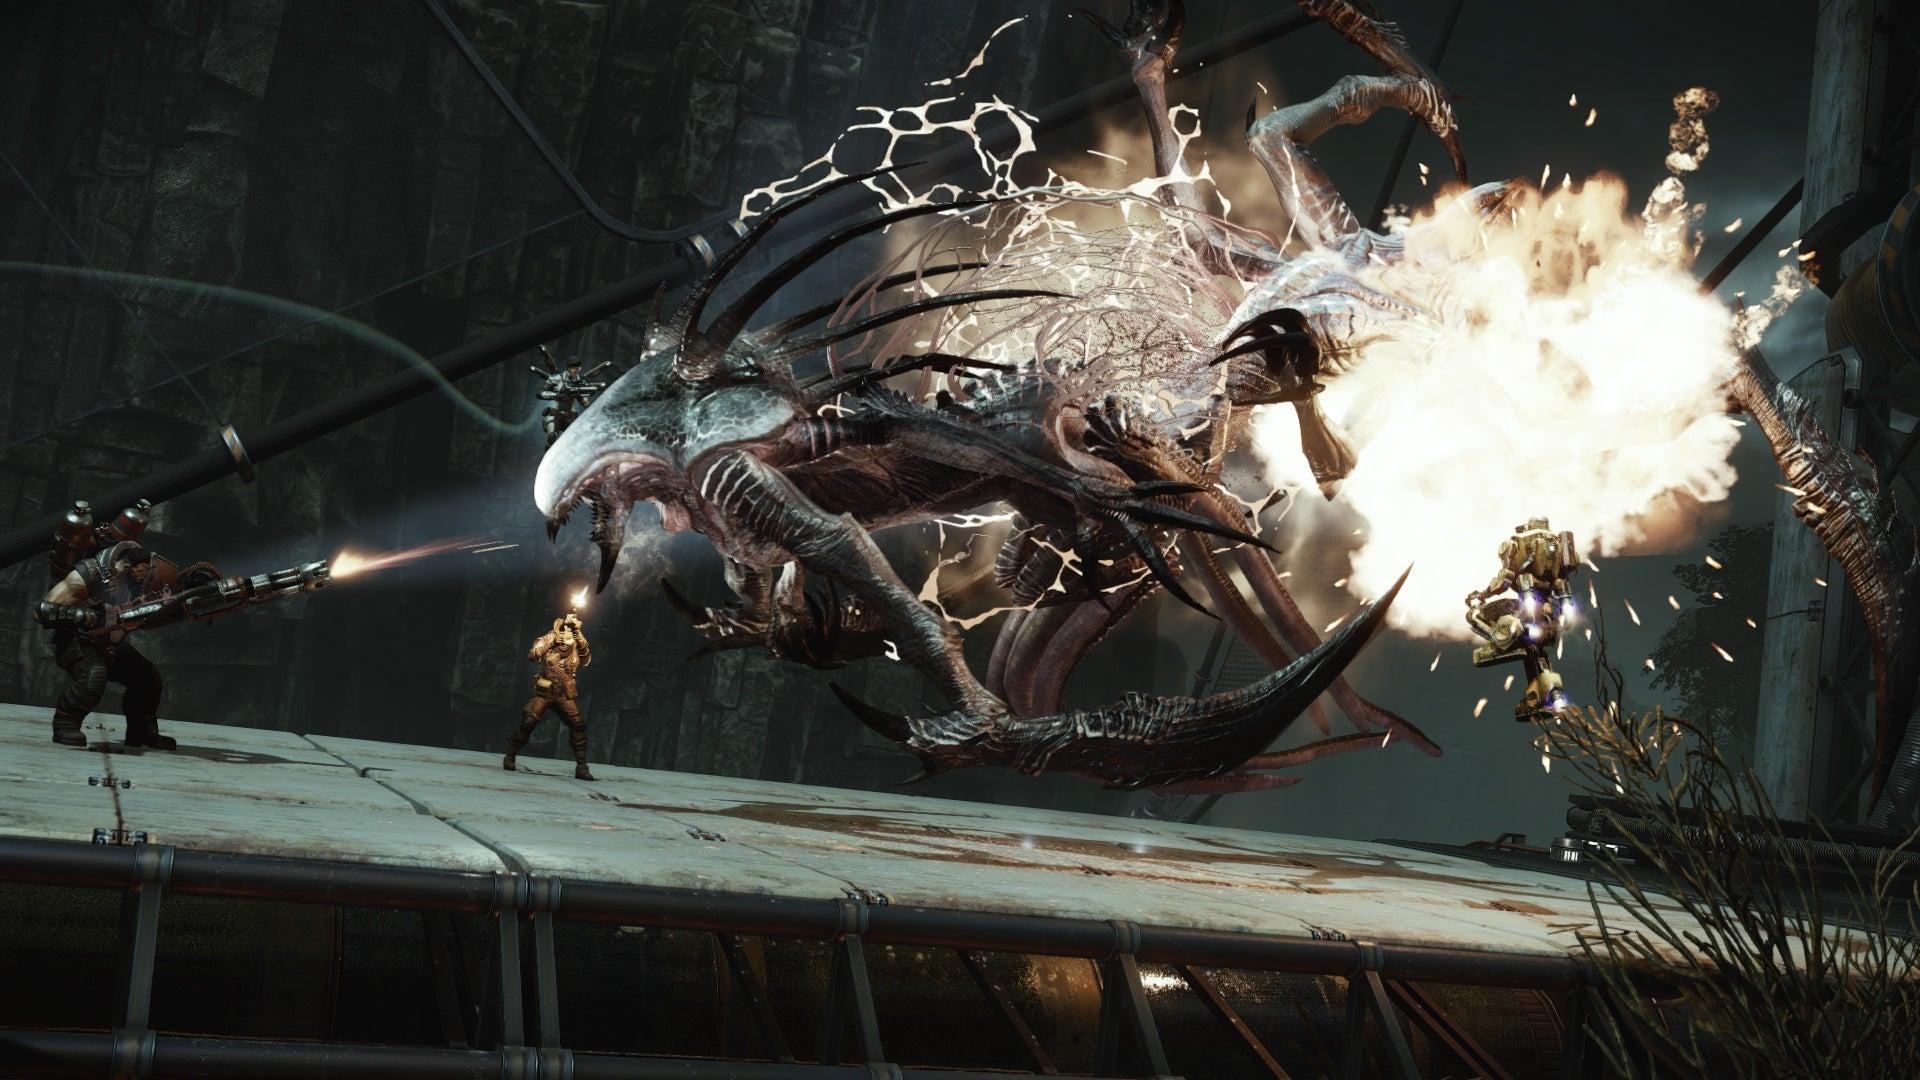 Image for Evolve 1.3 patch nerfs Wraith, adjusts Kraken